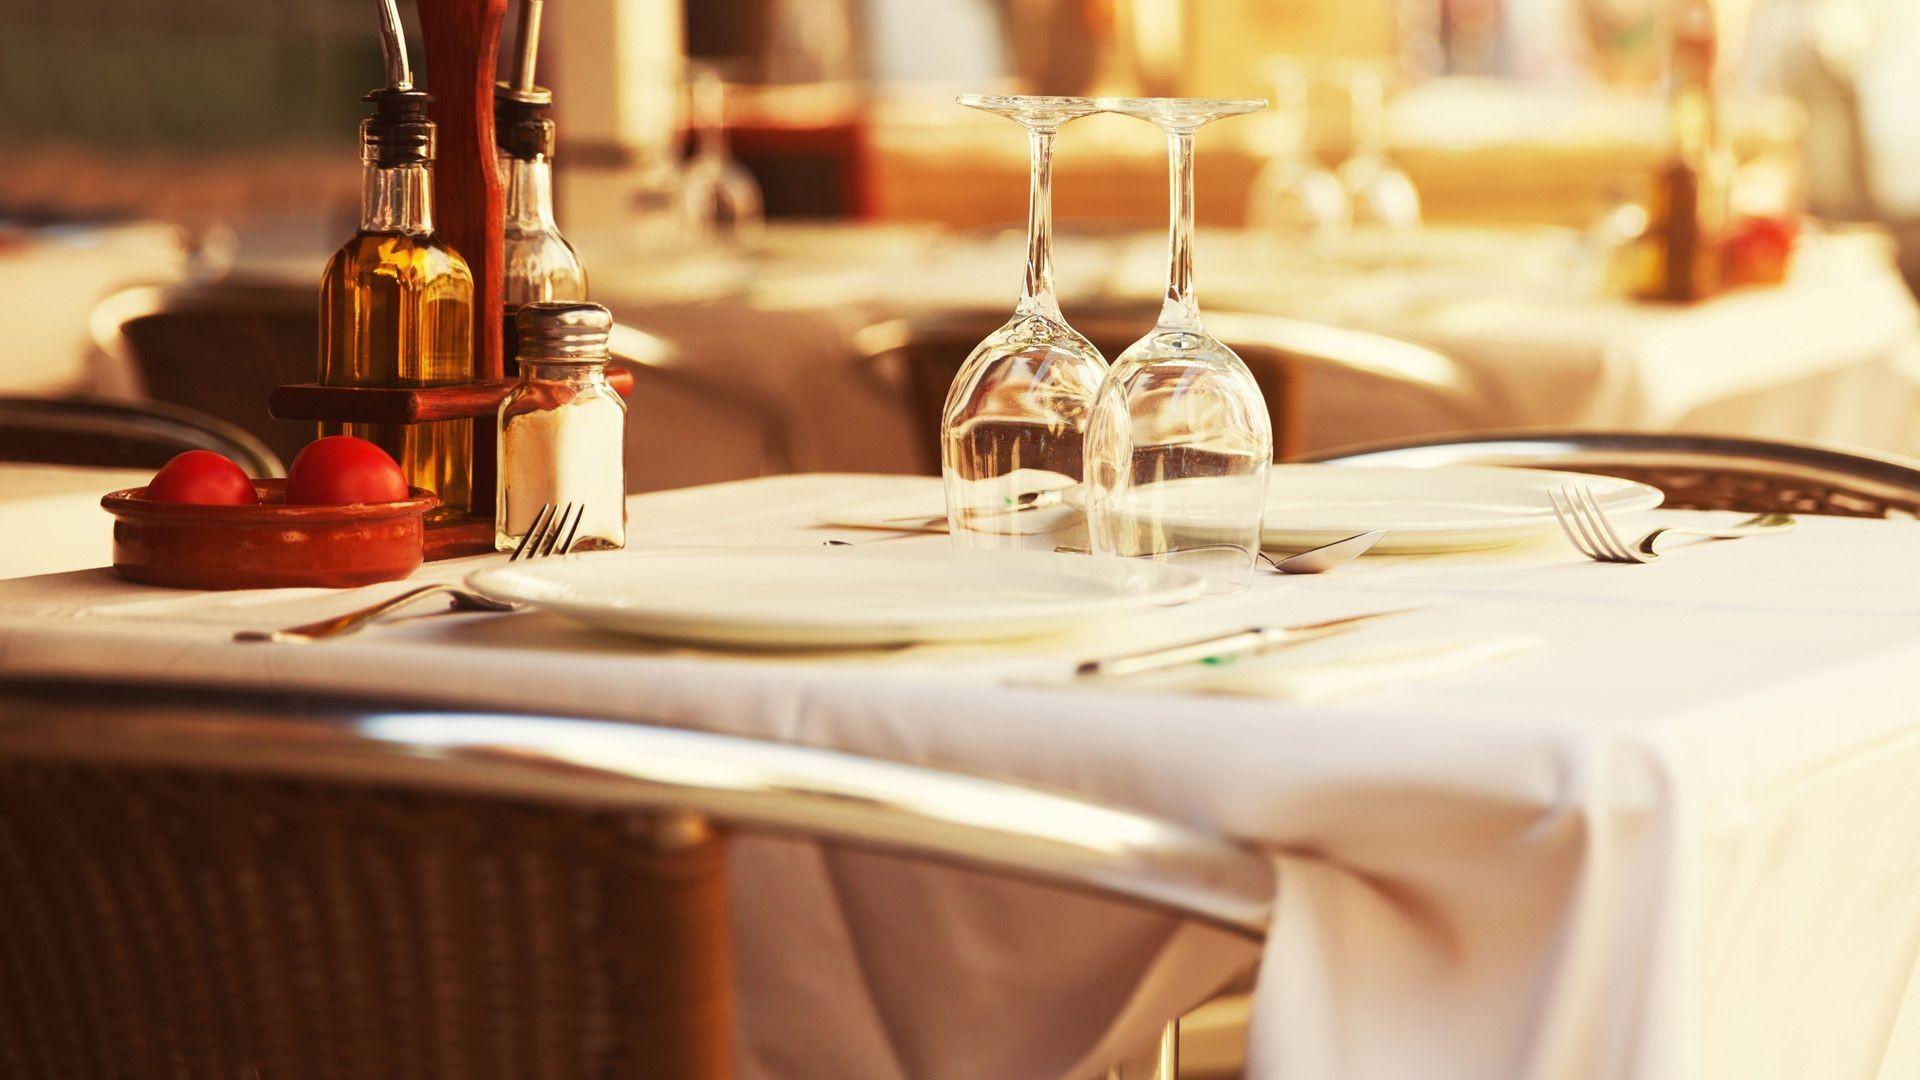 Restaurante especializado en comida catalana tradicional en Reus